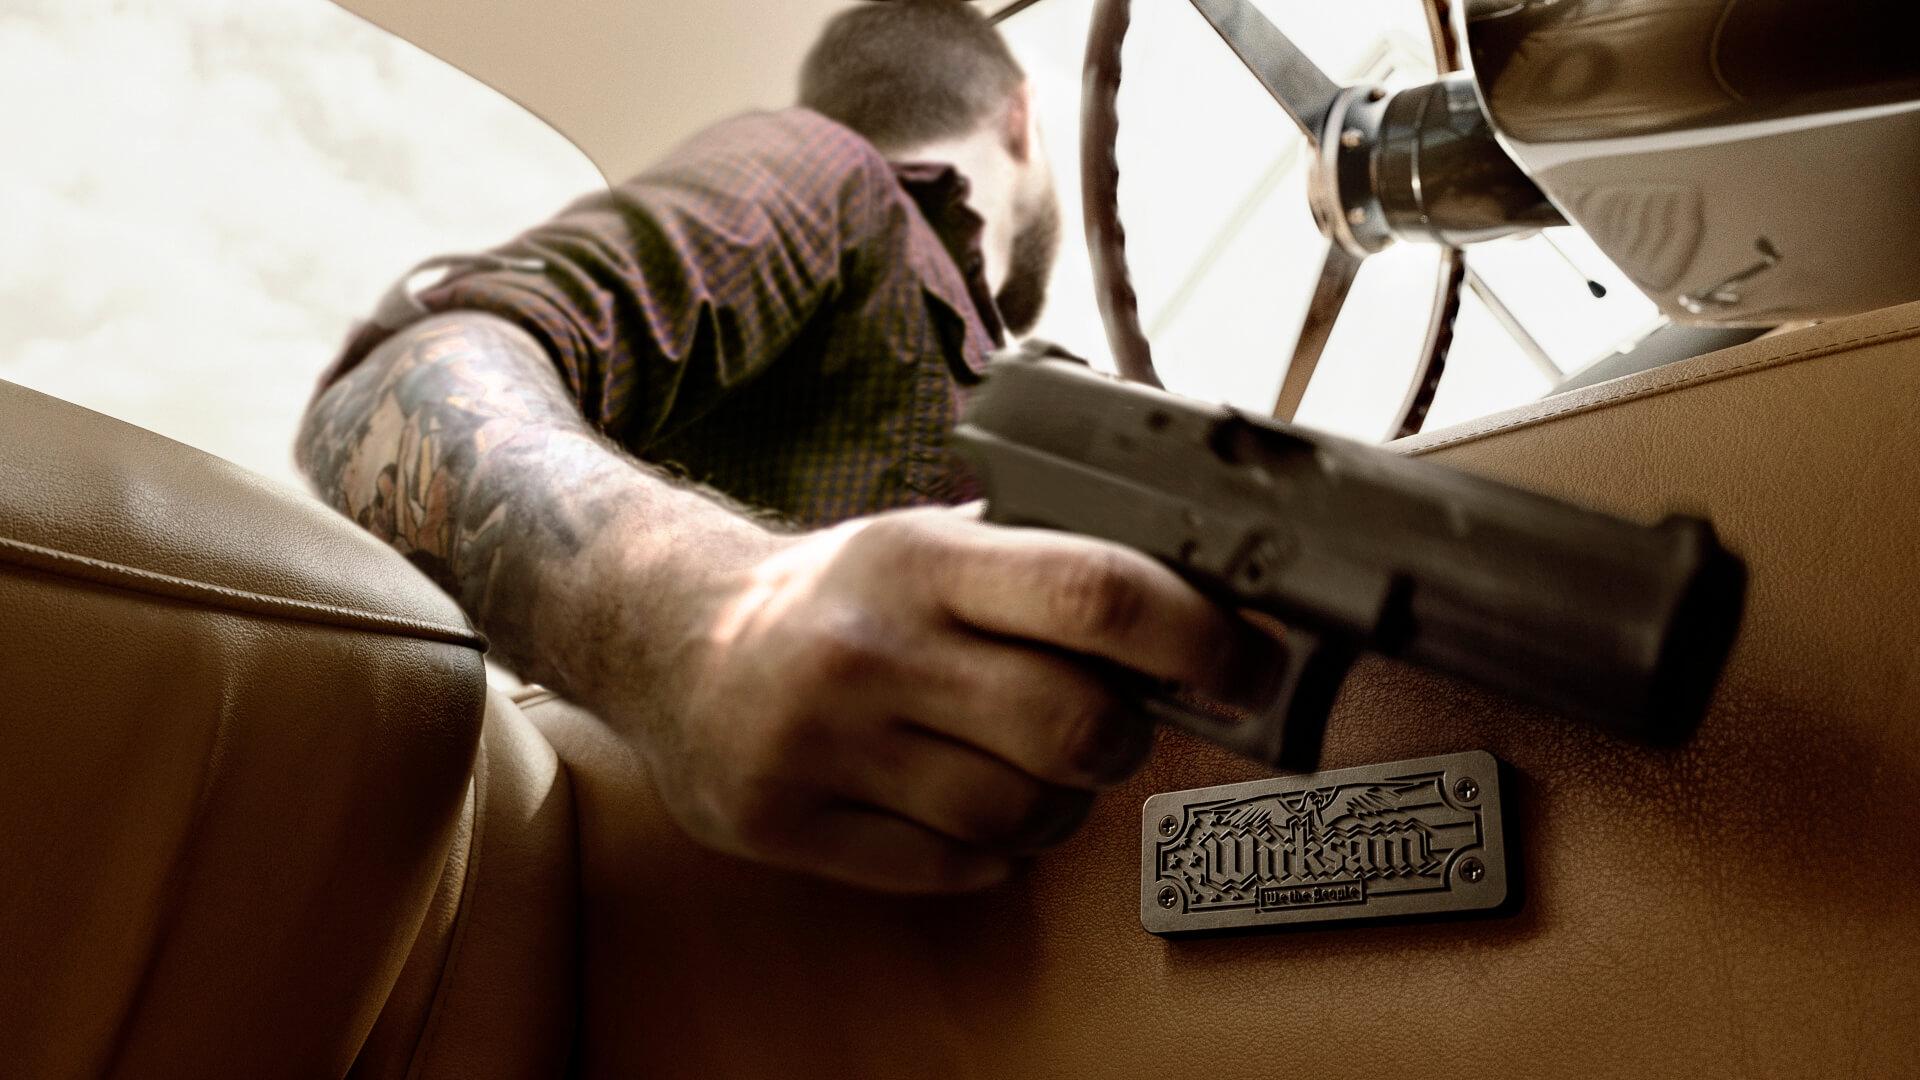 3D Visualization for Selling Gun Magnets Online